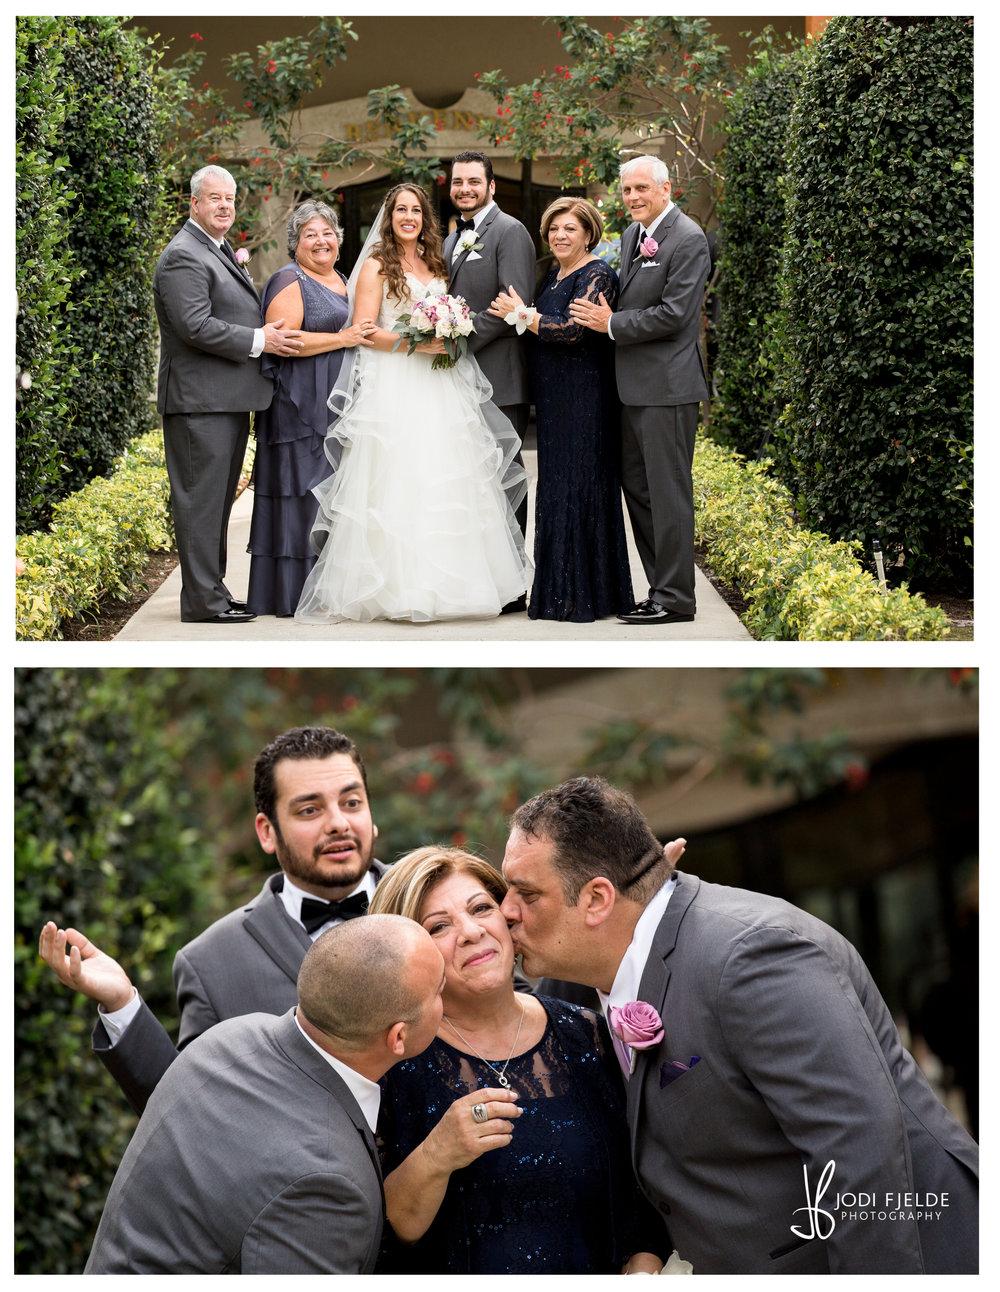 Boynton_Beach_Florida_ Benvenuto_Wedding_Heather__Doug_Married_12.jpg